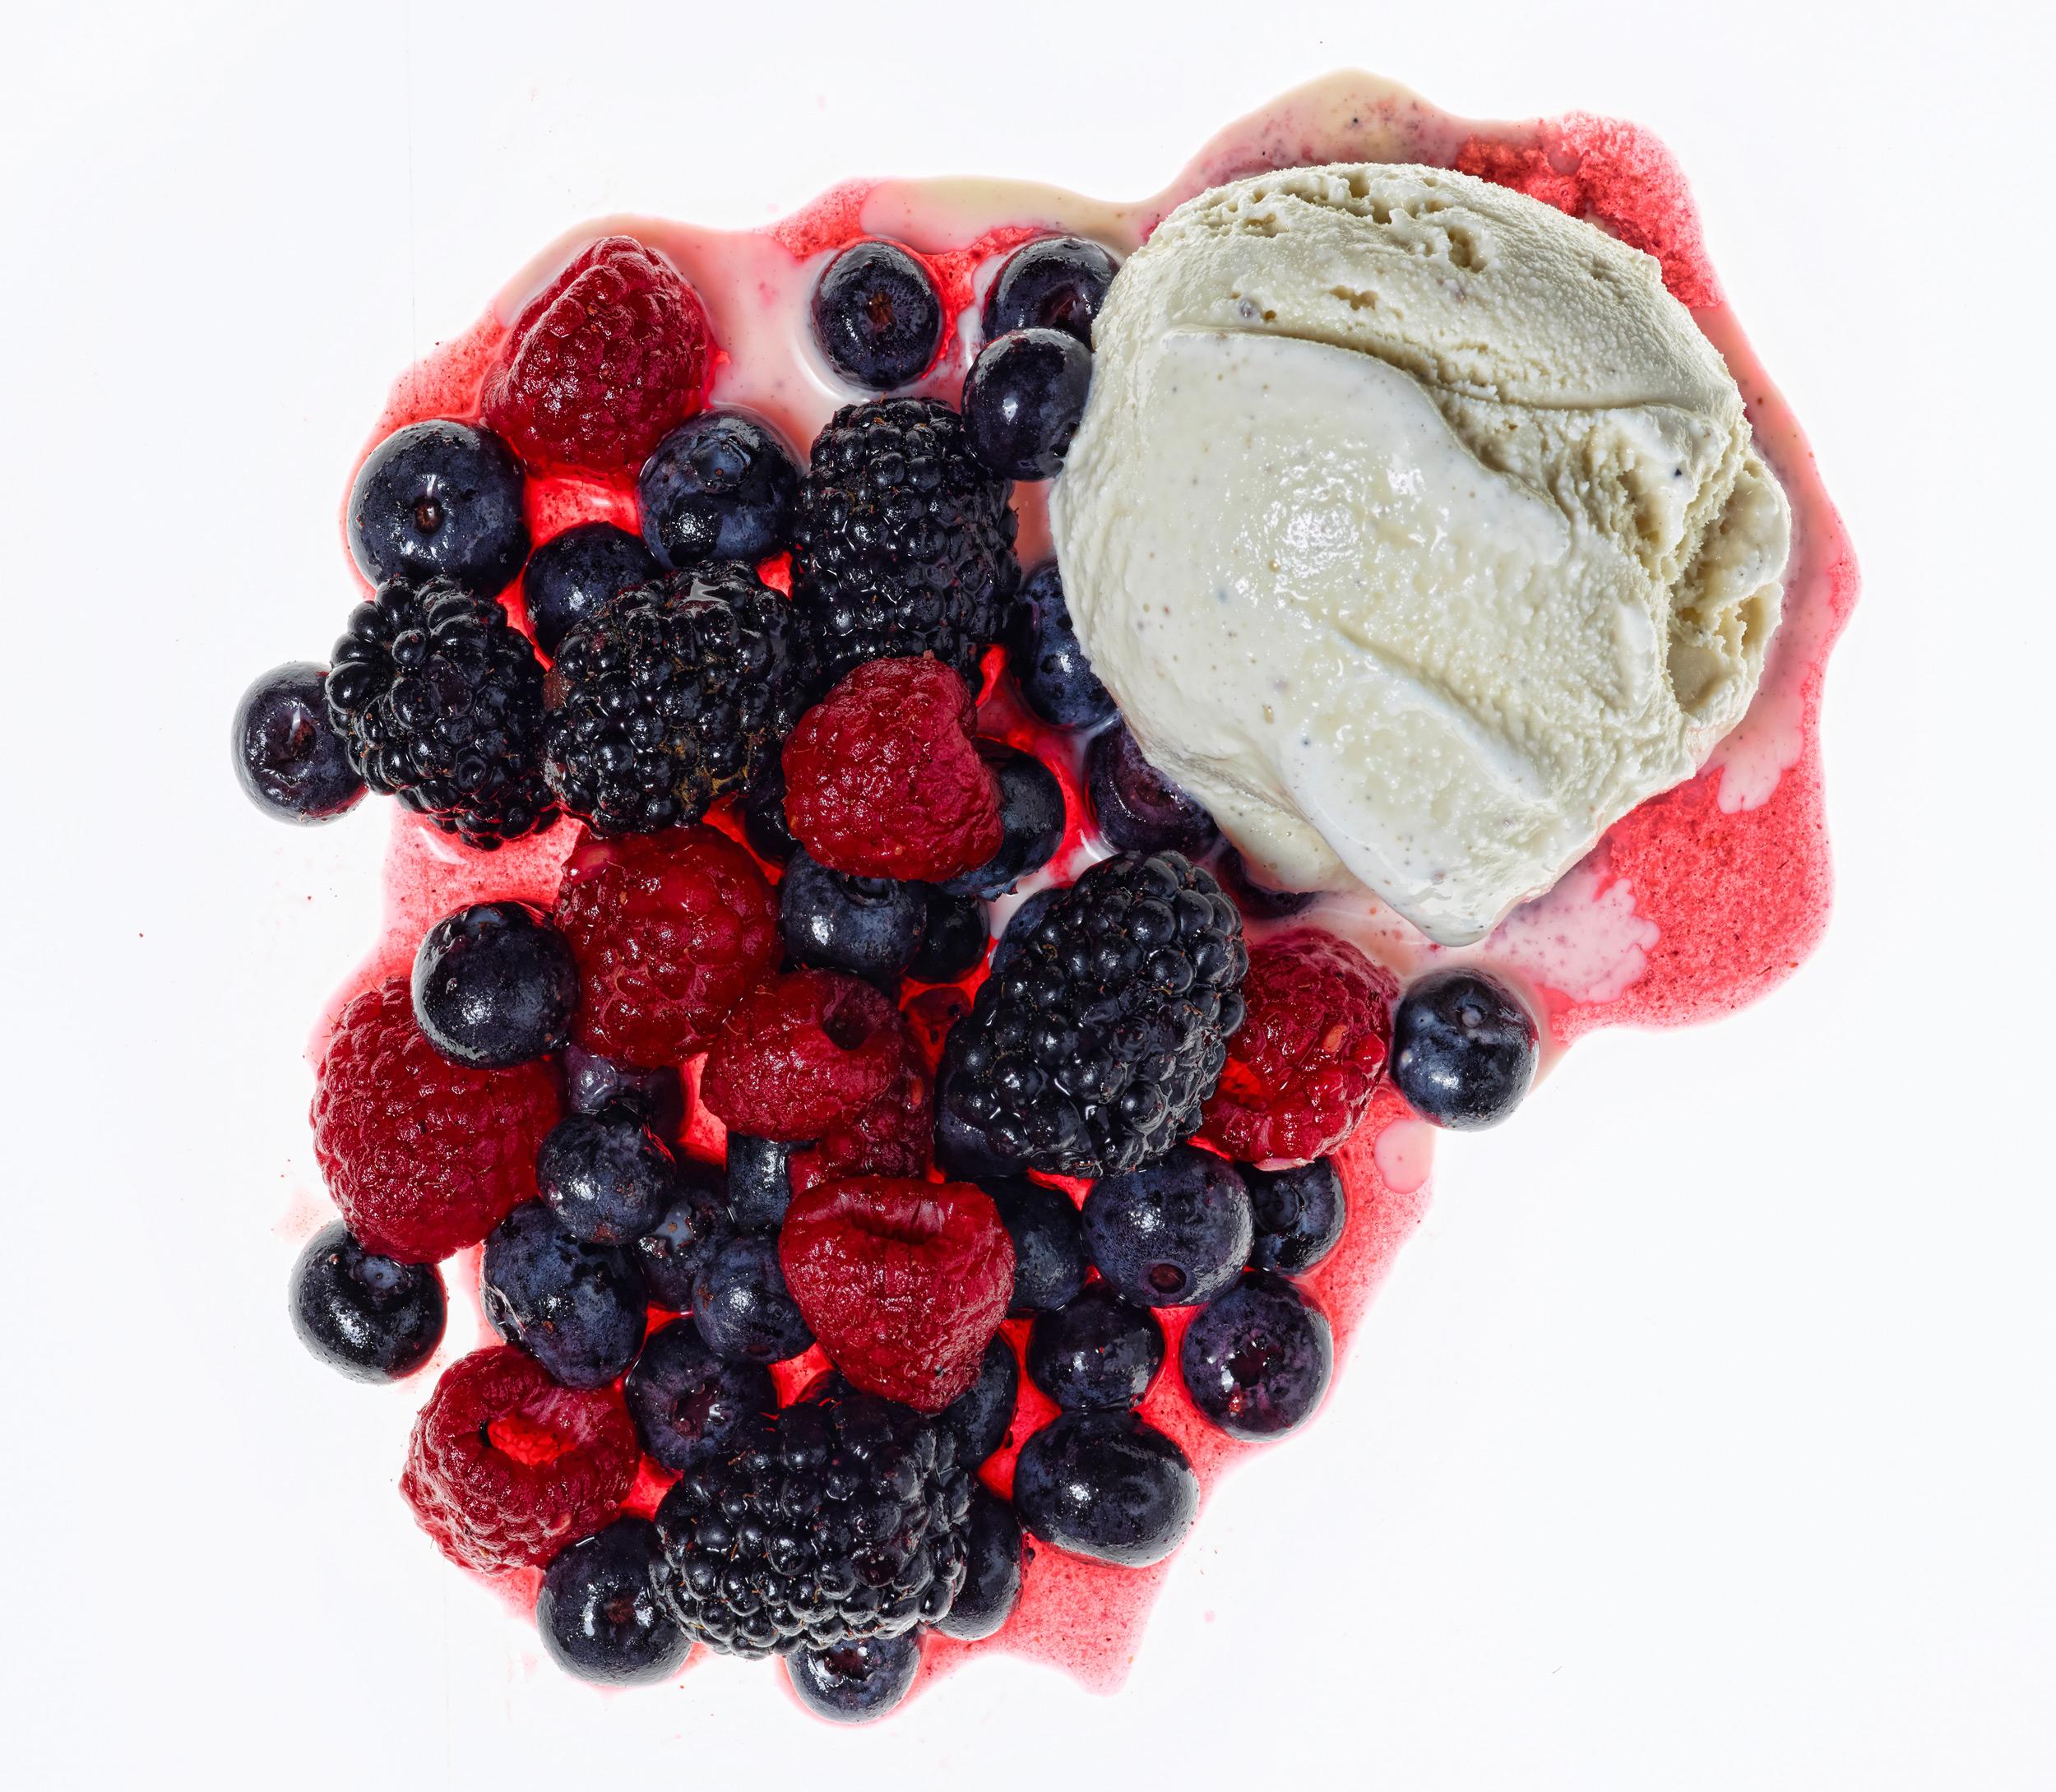 Triple Berry Compote with Vanilla Ice Cream